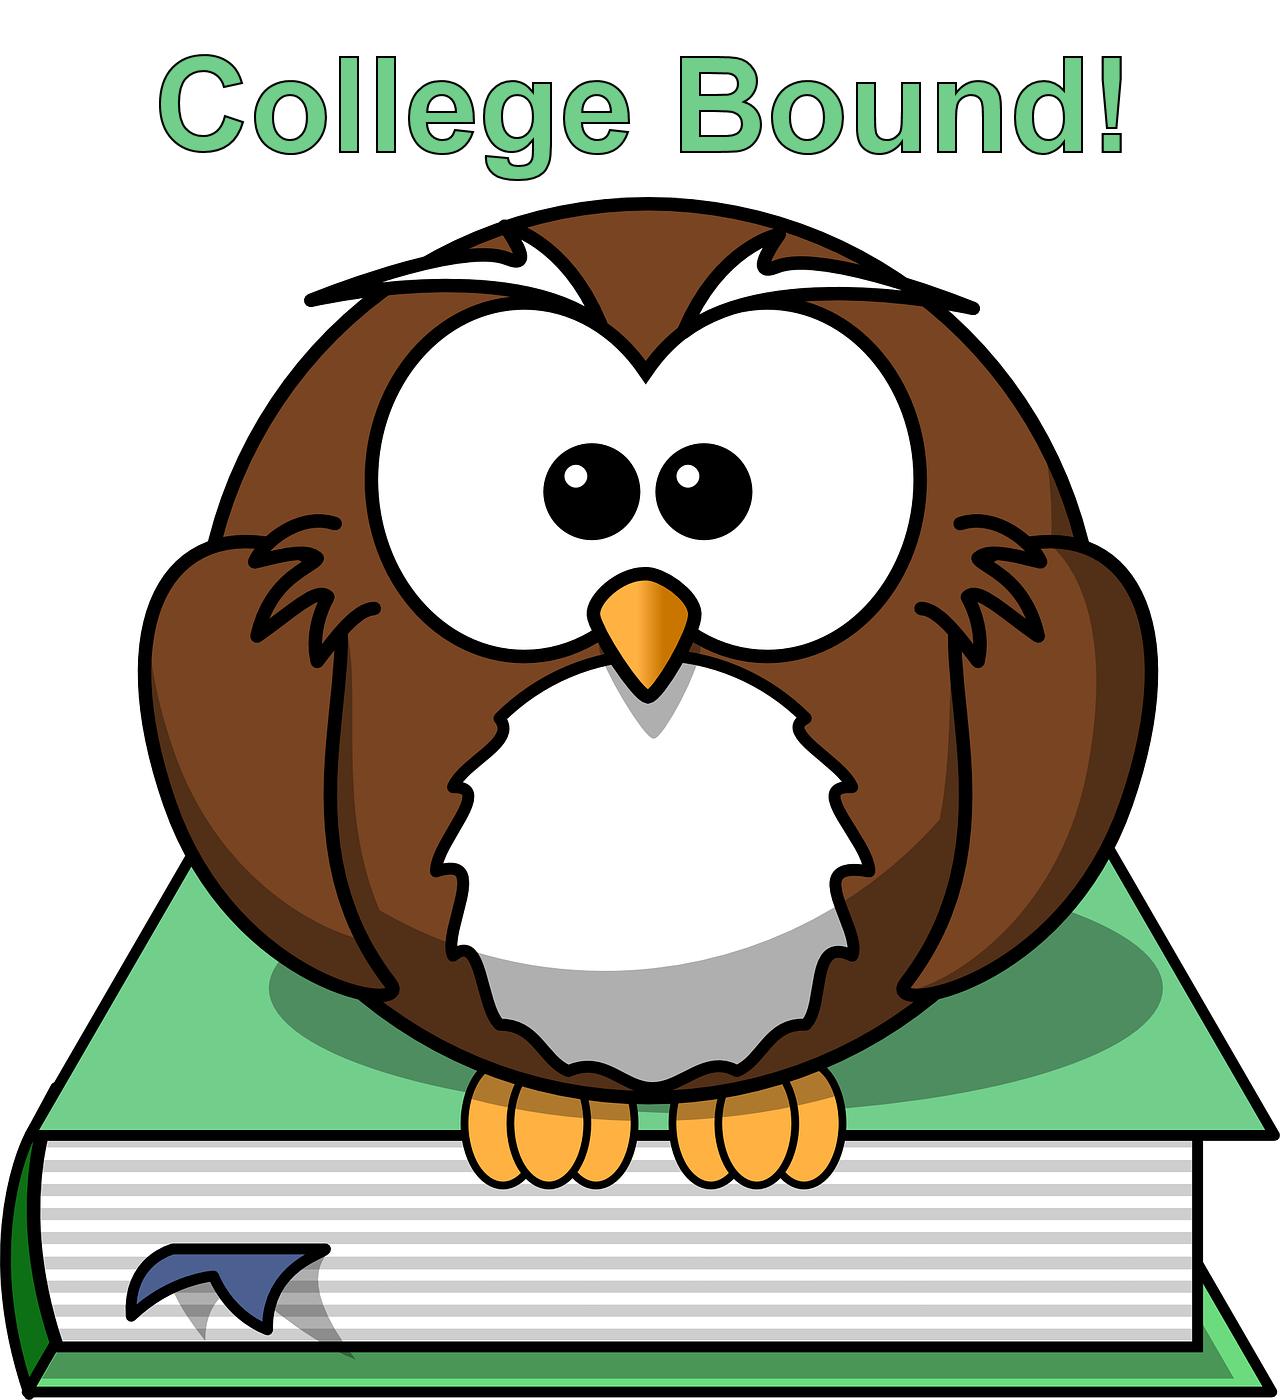 College Bound Circle with Graduation Cap